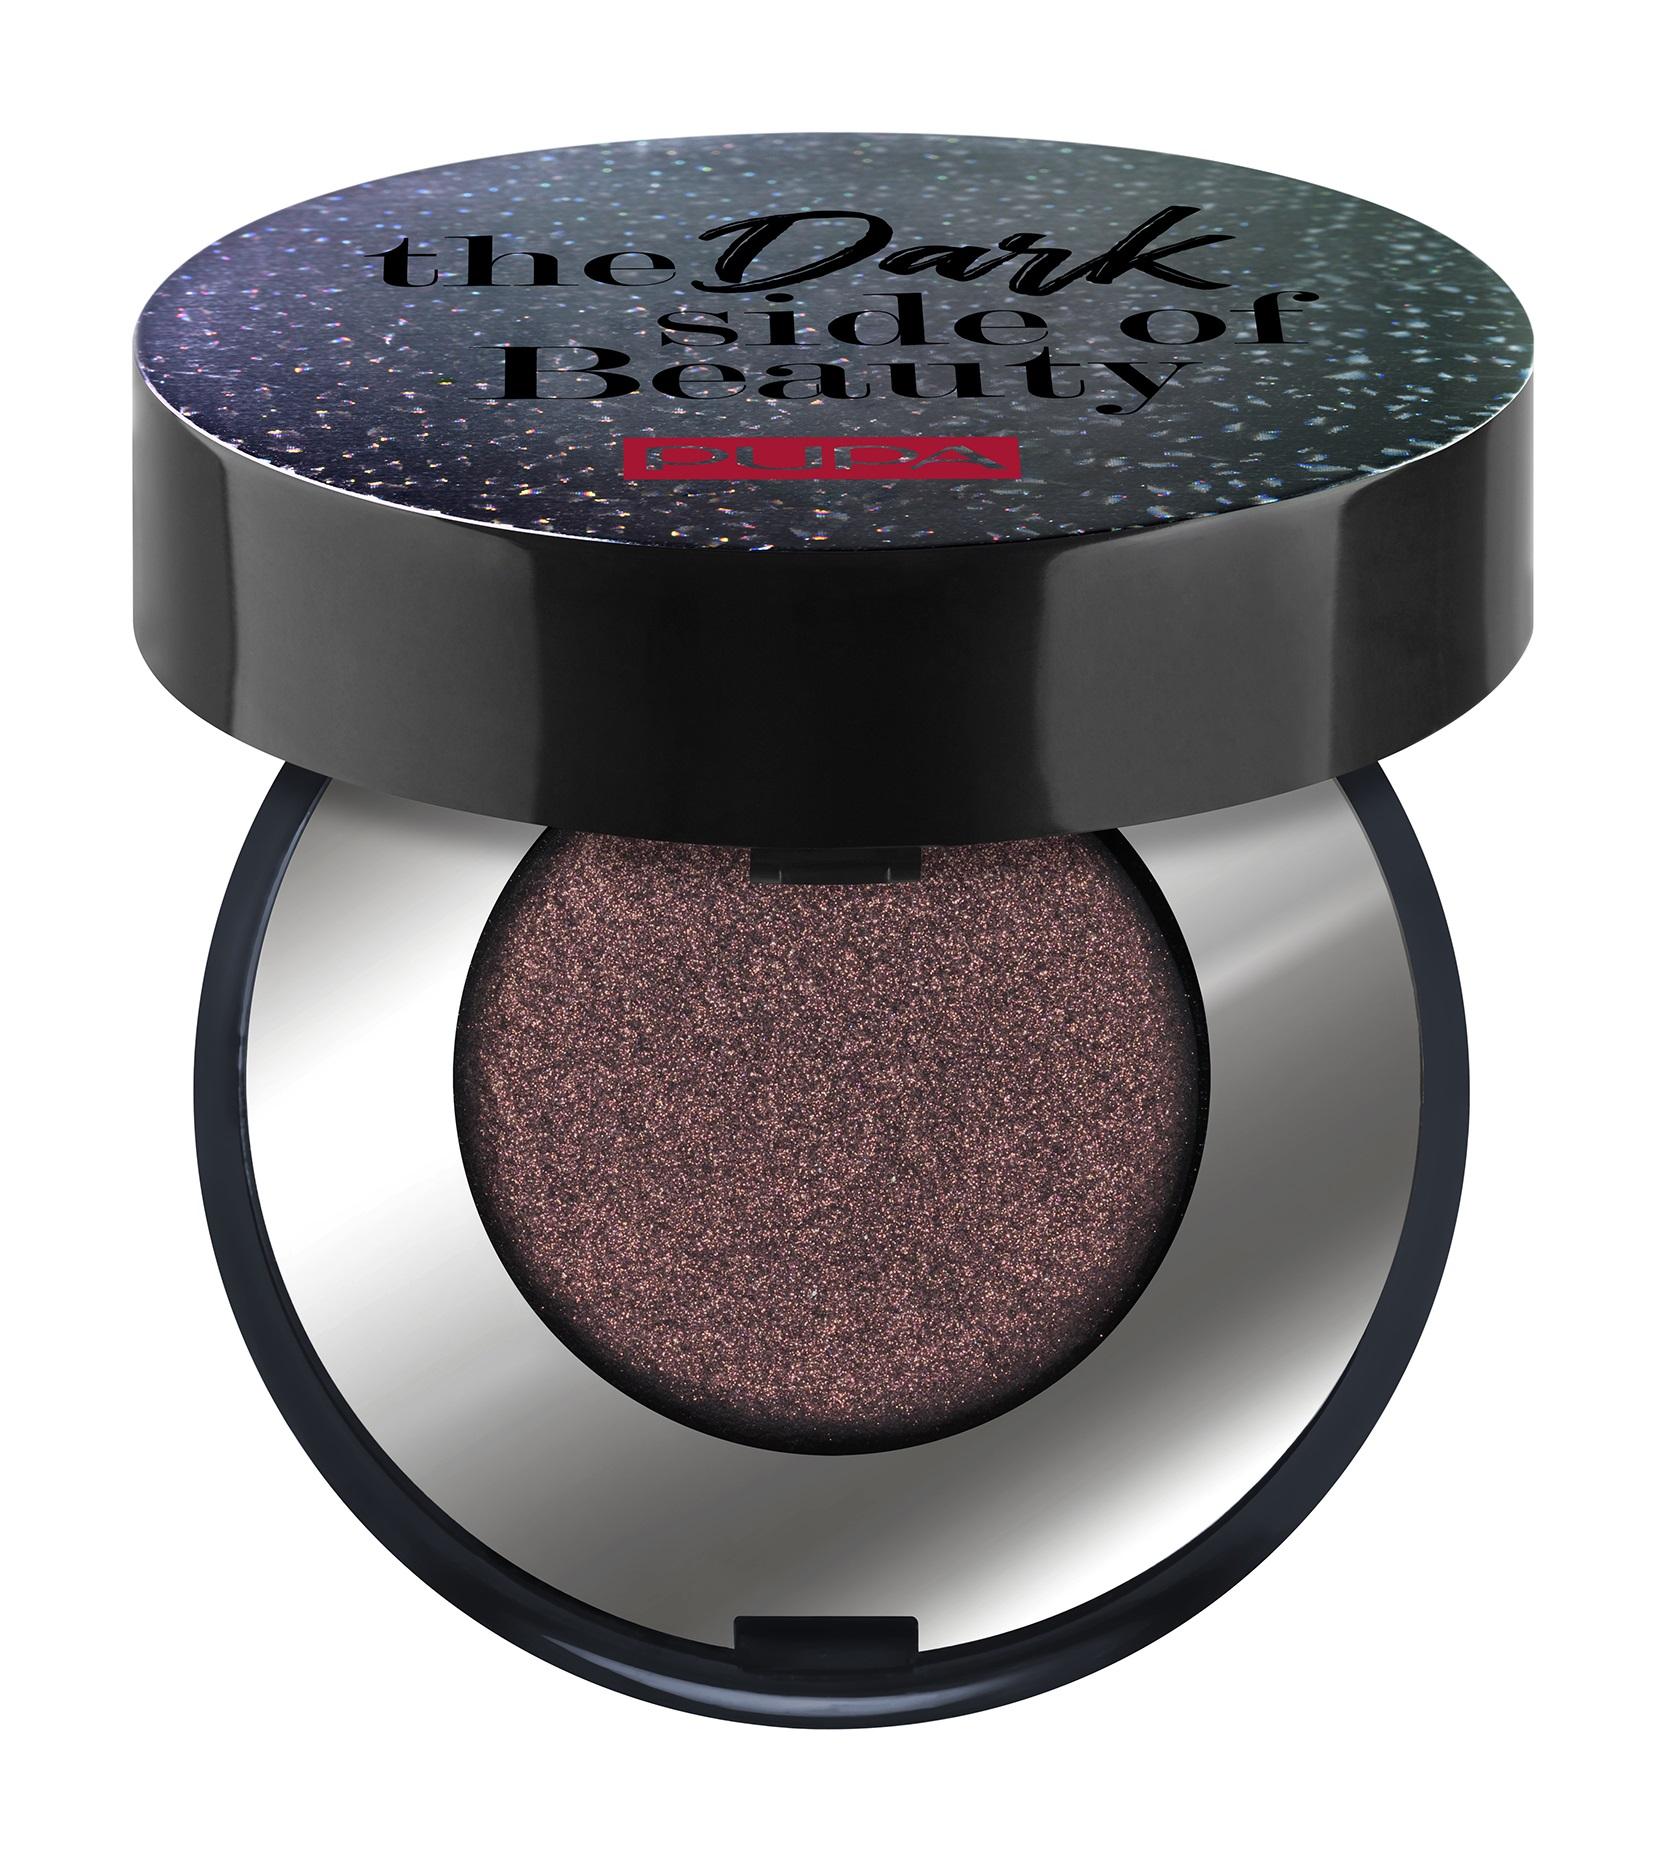 Тени Pupa The Dark Side of Beauty